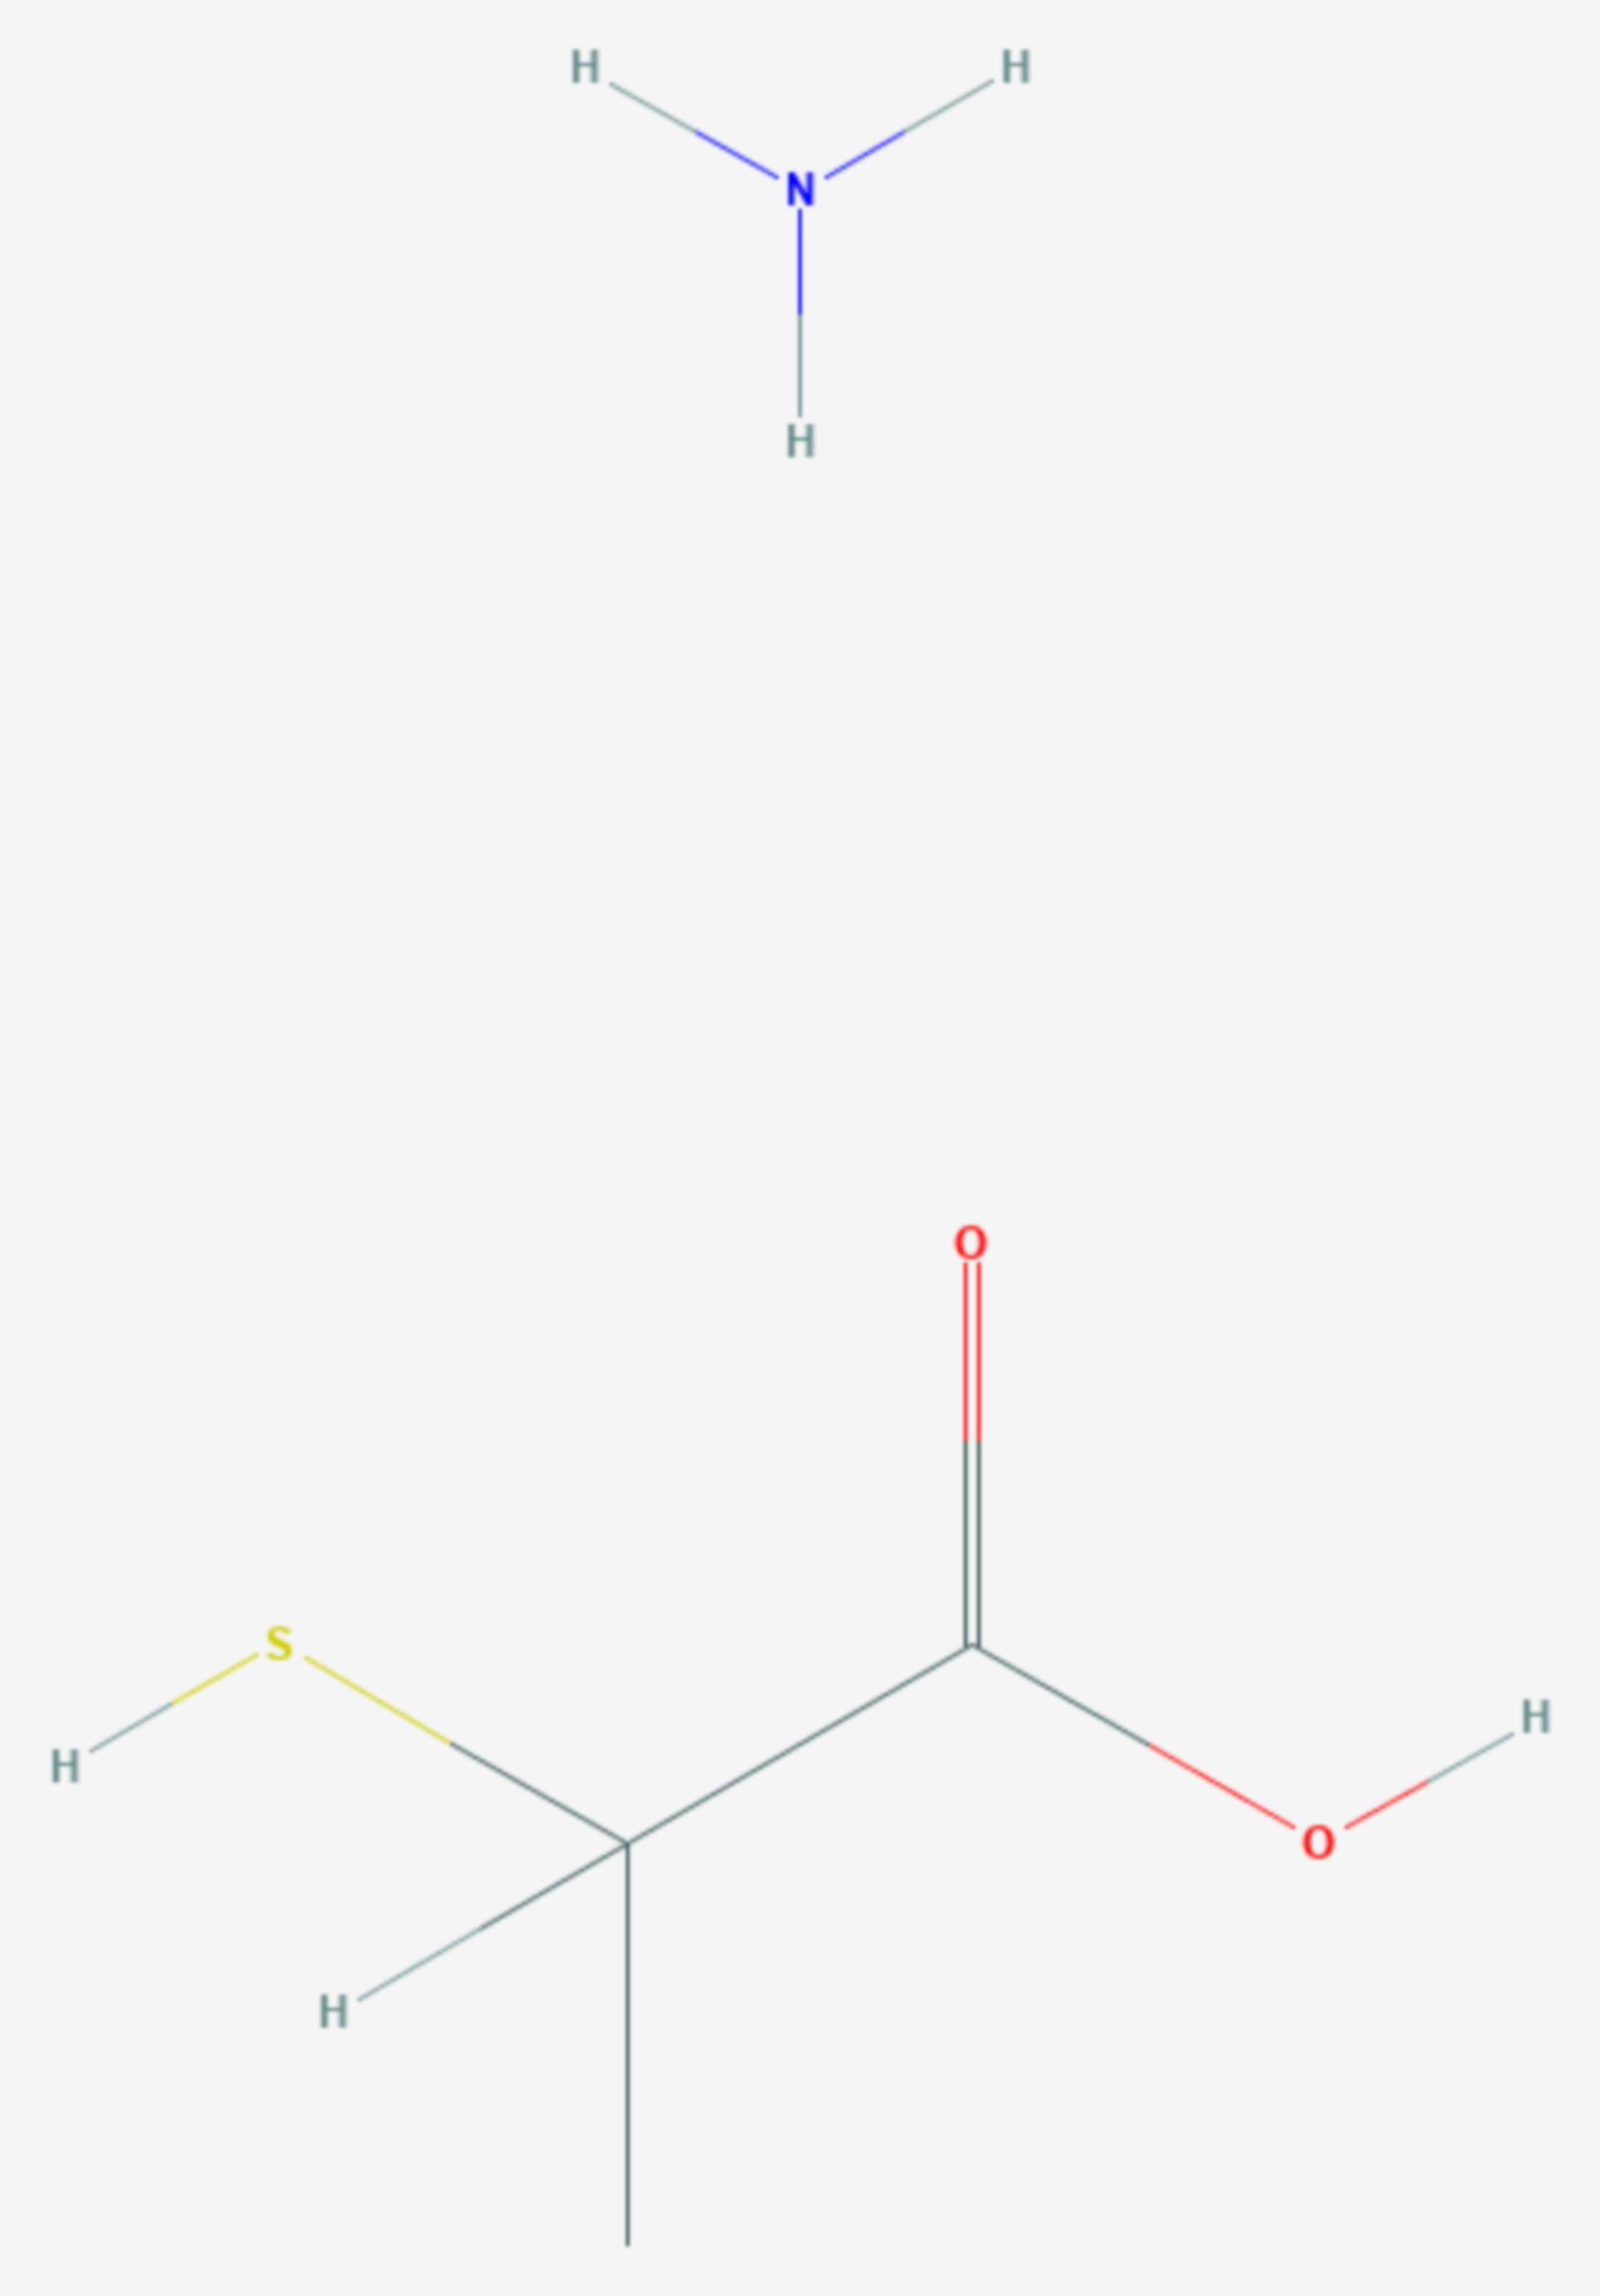 2-Mercaptopropionsäure (Strukturformel)